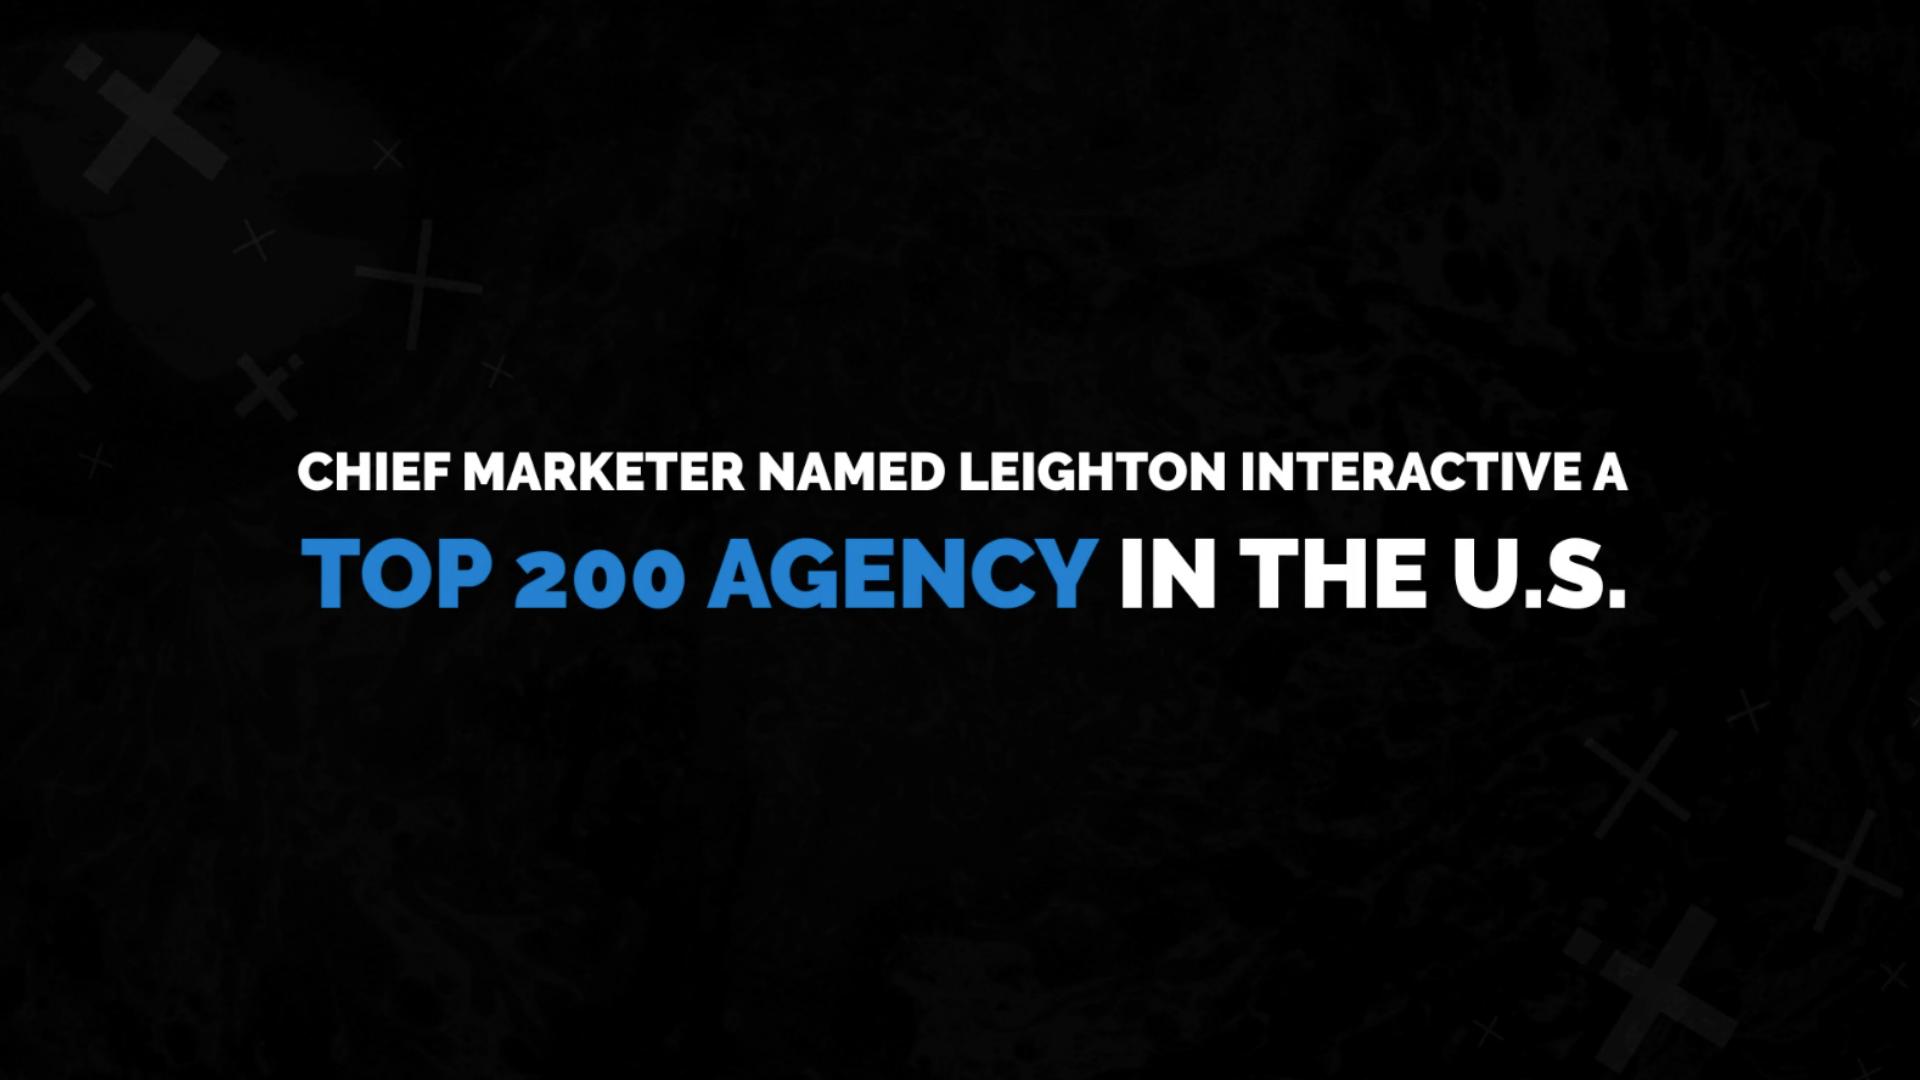 Chief Marketer Recognizes Leighton Interactive as a Top Agency